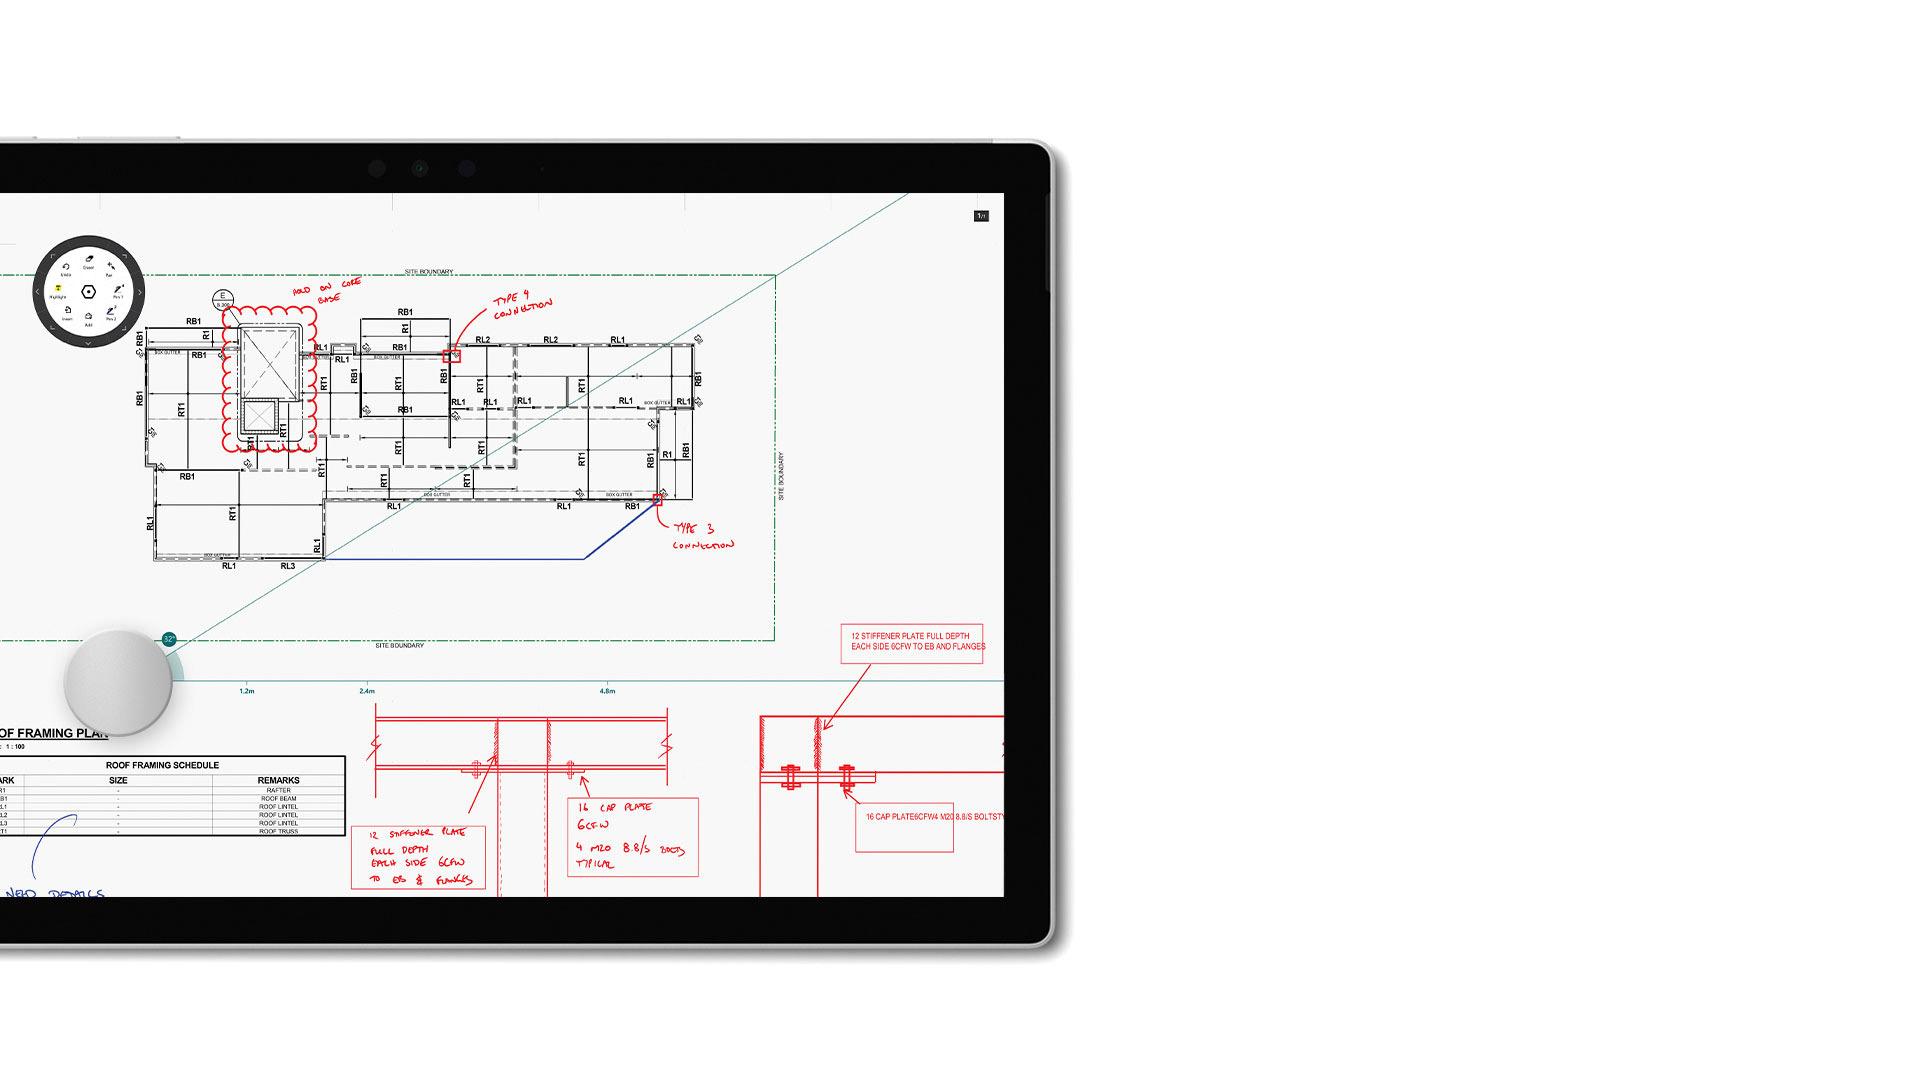 Surface 显示 Drawboard PDF 屏幕截图。